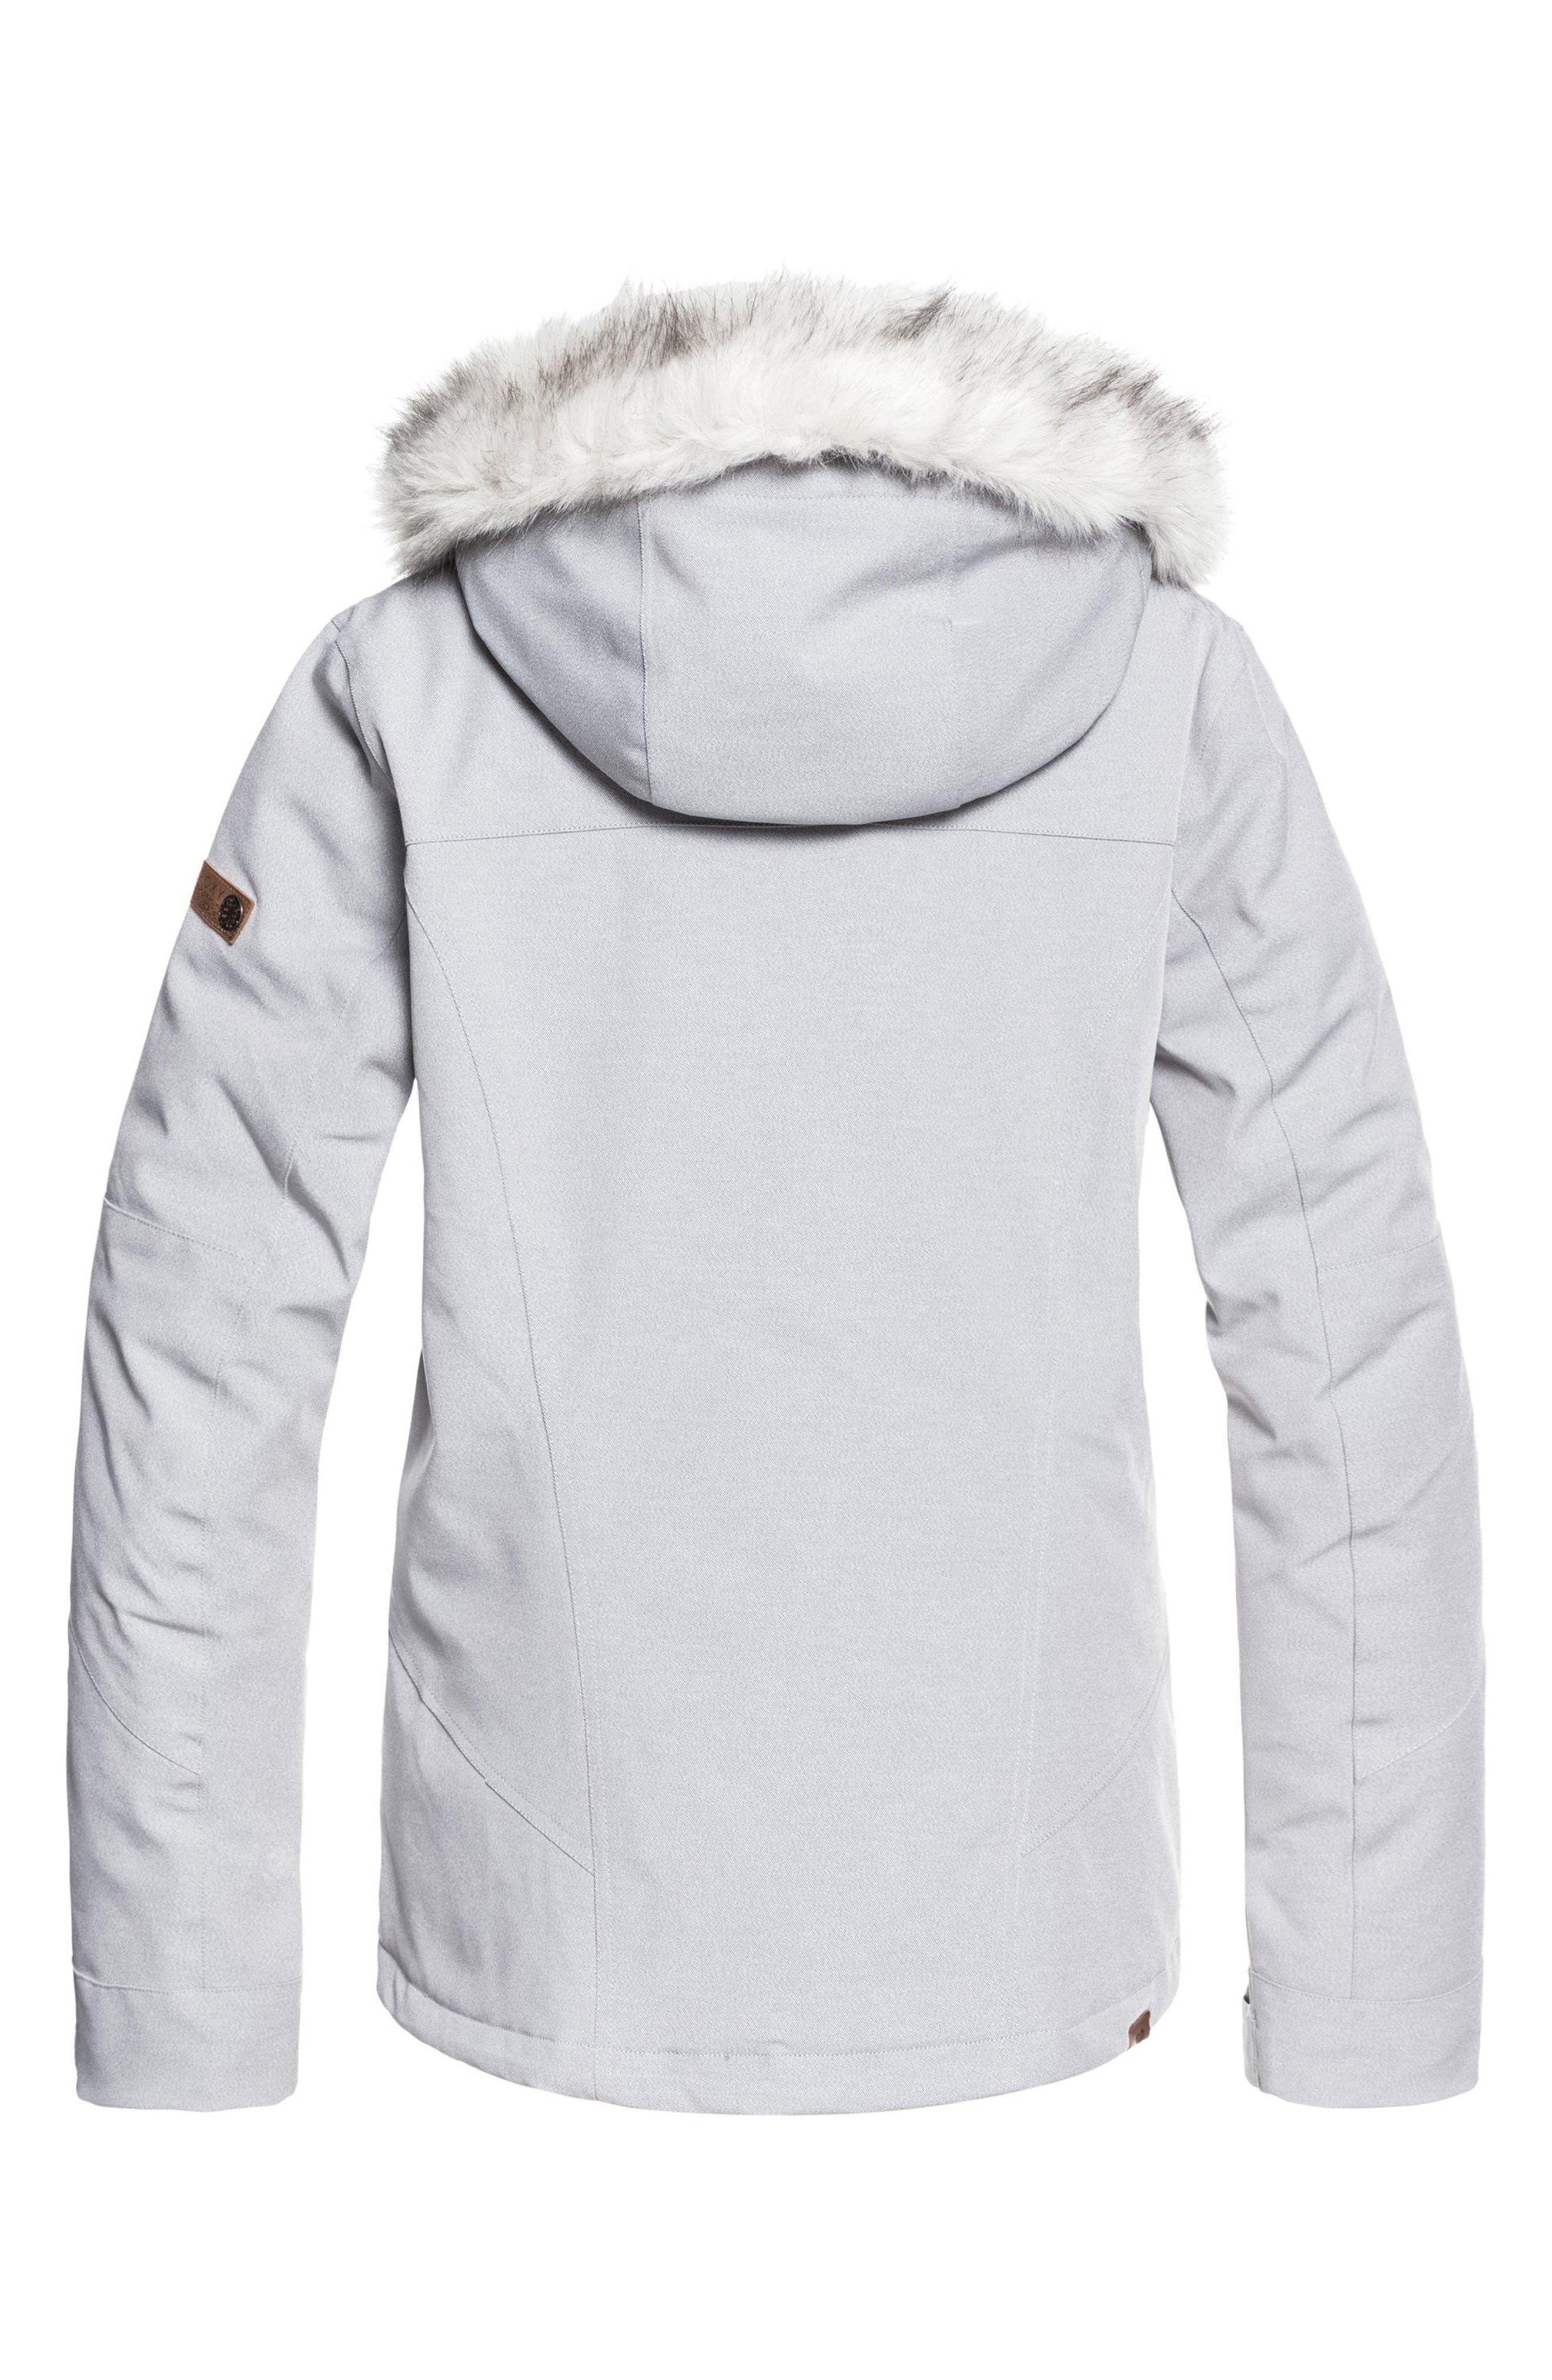 ROXY,                             Atmosphere Snow Jacket,                             Alternate thumbnail 3, color,                             020